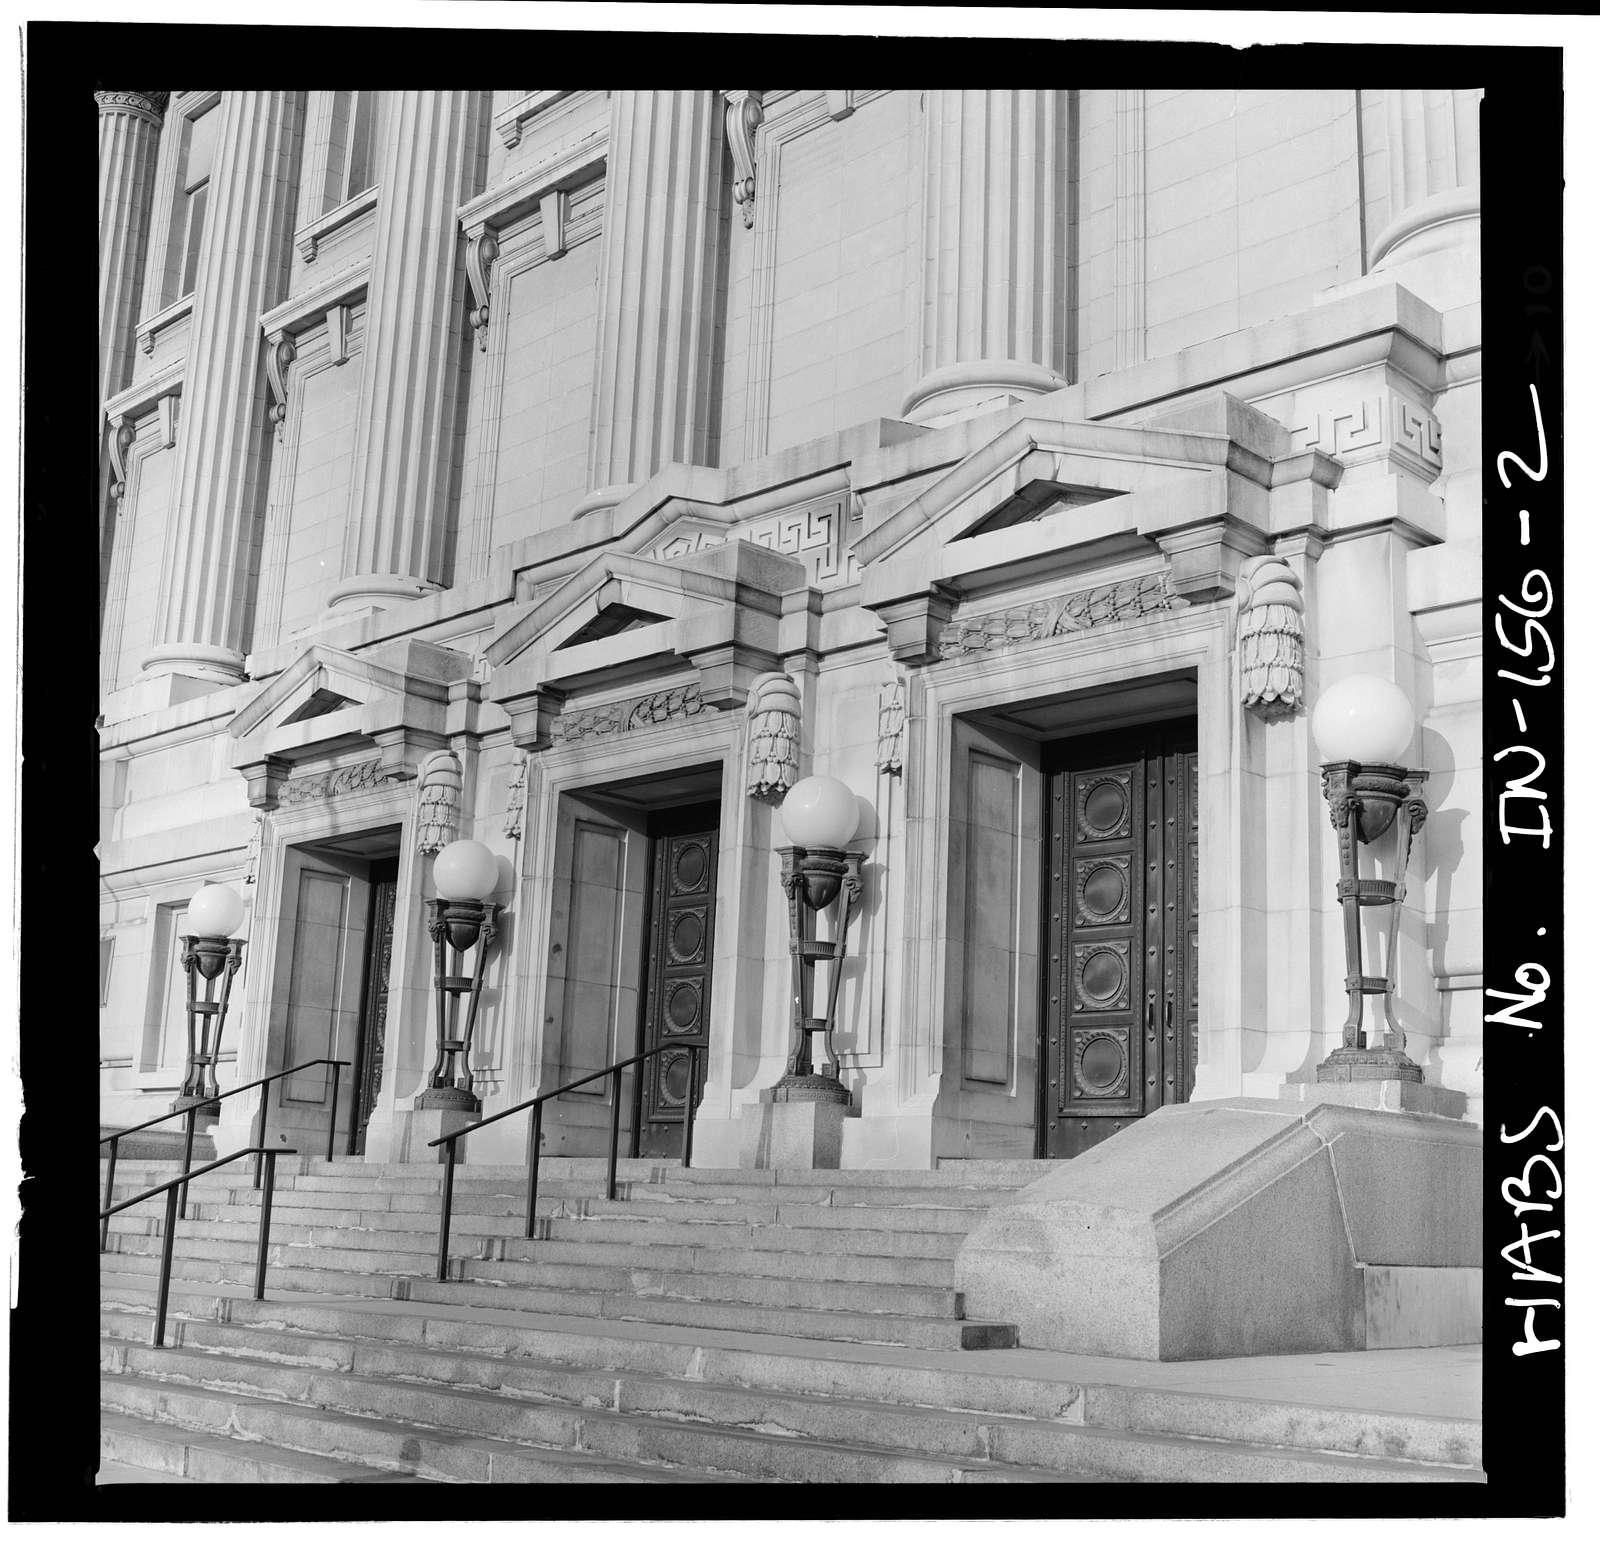 Indianapolis City Hall, 202 North Alabama, Indianapolis, Marion County, IN